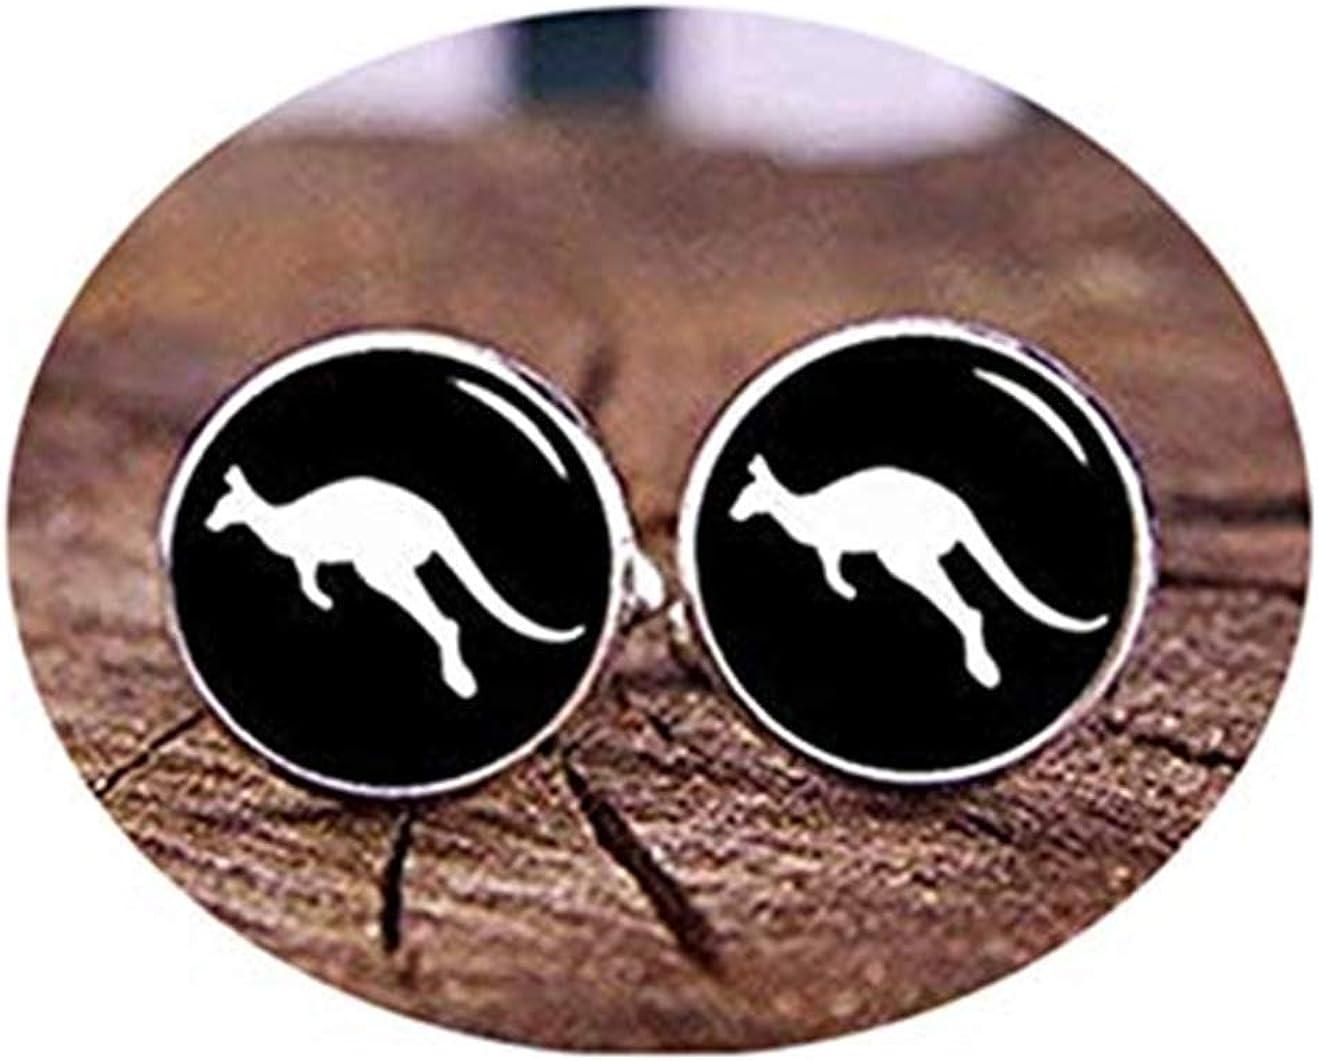 Death Devil Art Picture Cuff Links,Kangaroo Cufflinks, Custom Cufflinks, Australian Jewelry, Australian Kangaroo Cuff Links, Australian Gifts, Custom Any Photo Or Text, Gifts,Gift of Love